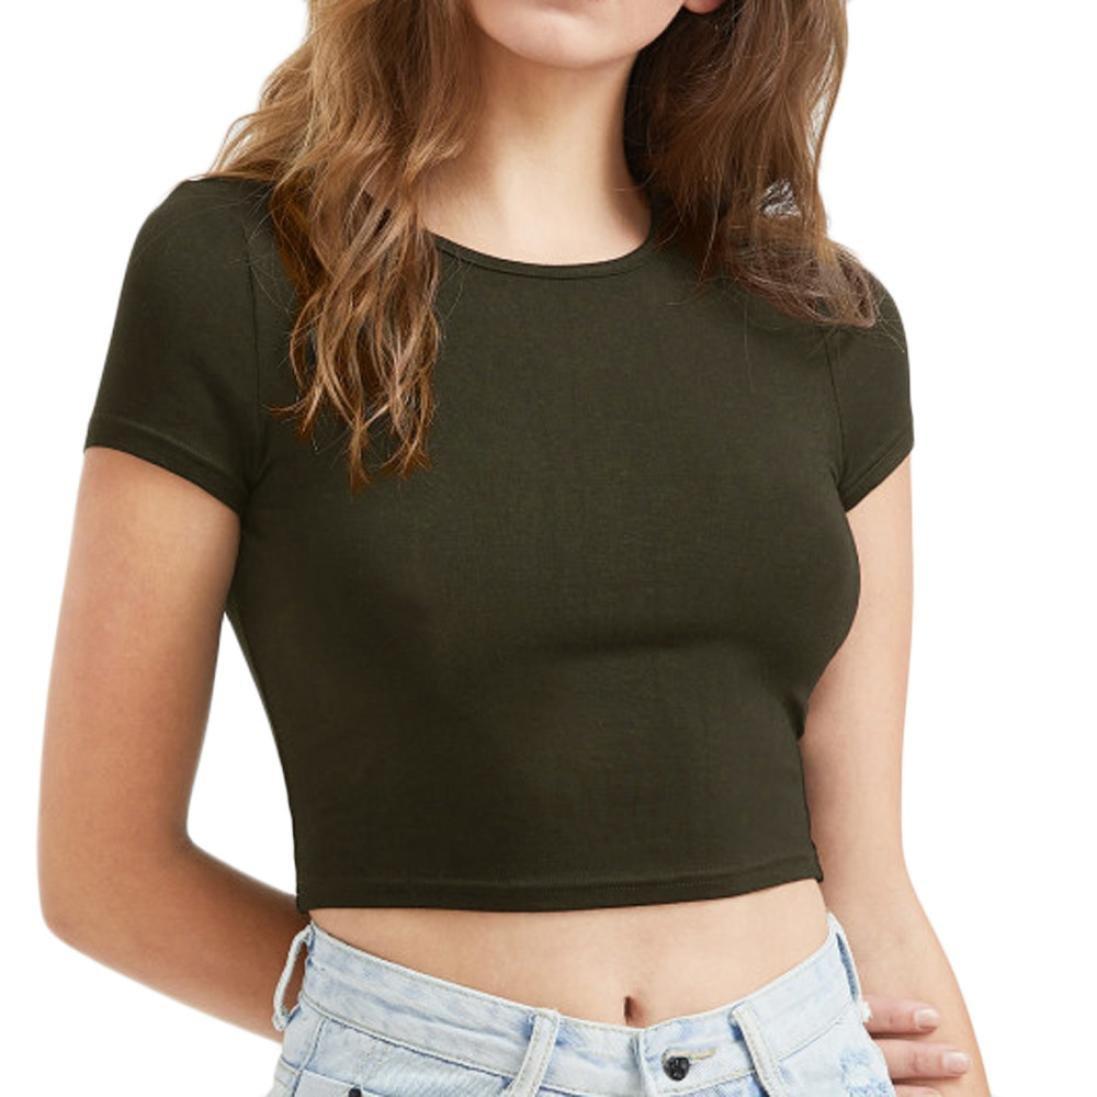 ESAILQ Frauen O-Neck Pure Color Kurzarm Bluse T-Shirt Tops